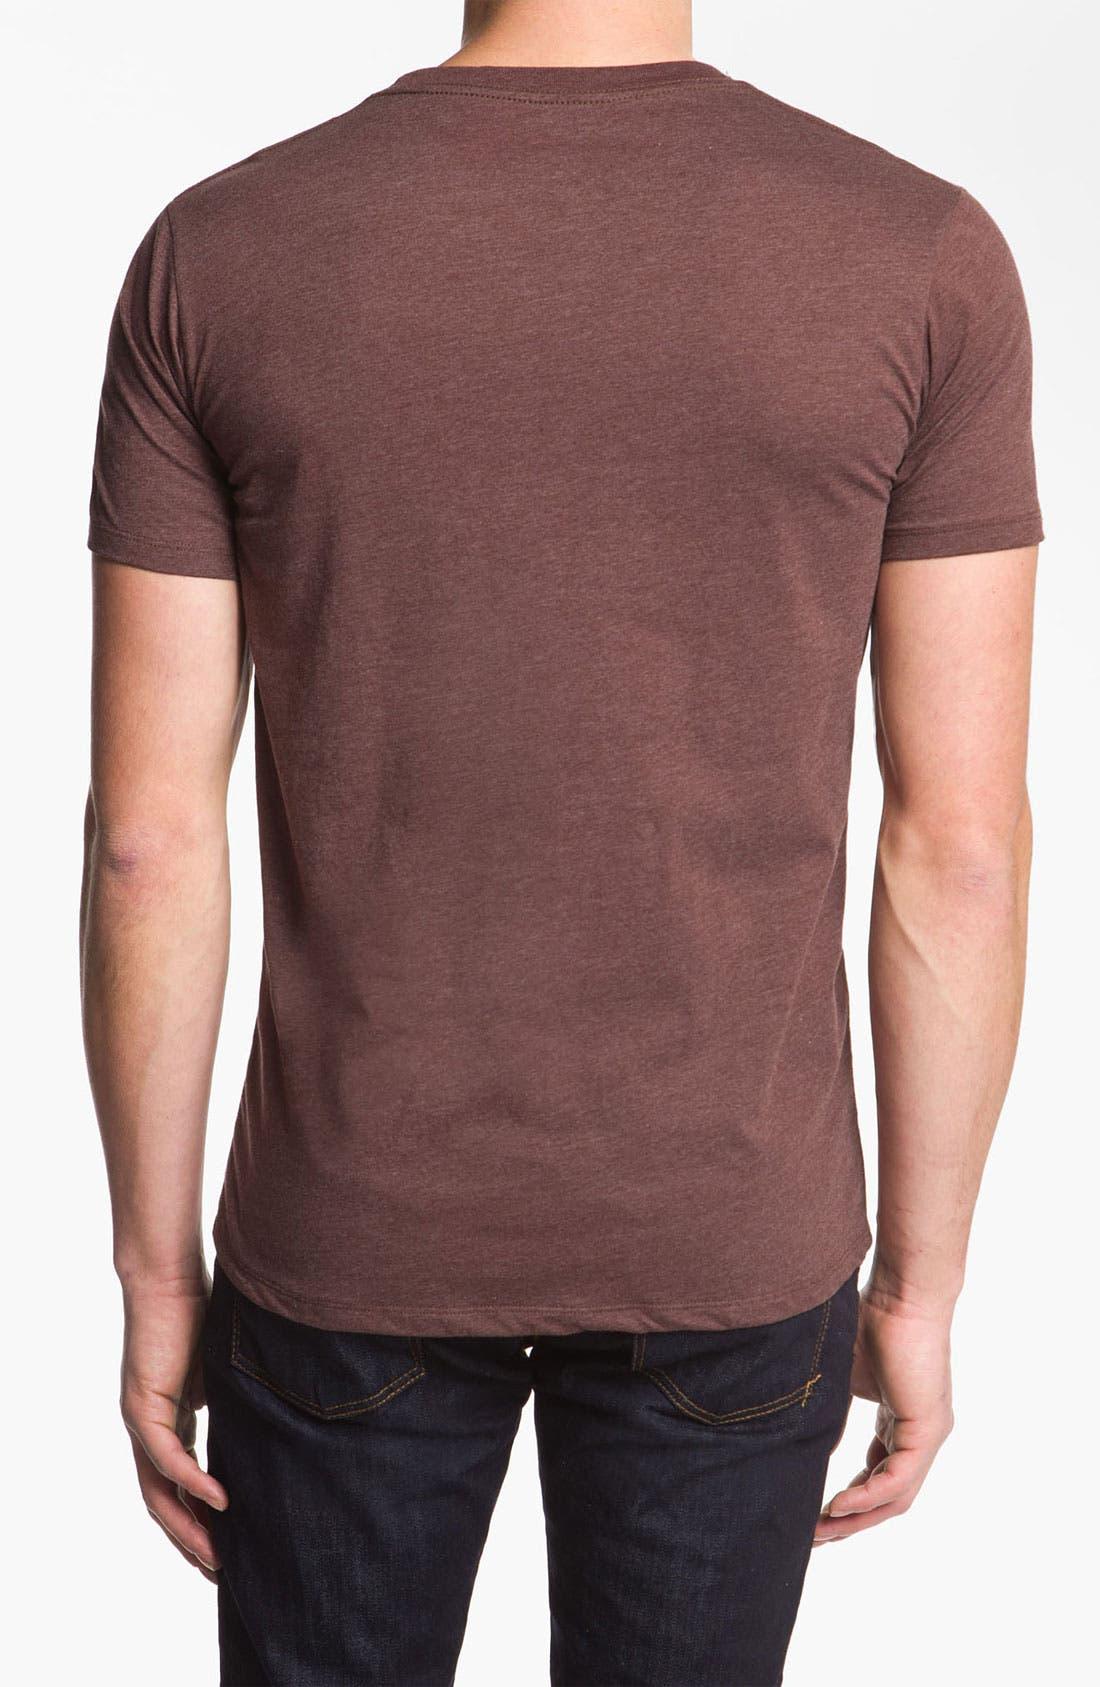 Alternate Image 2  - Headline Shirts 'Regular' T-Shirt